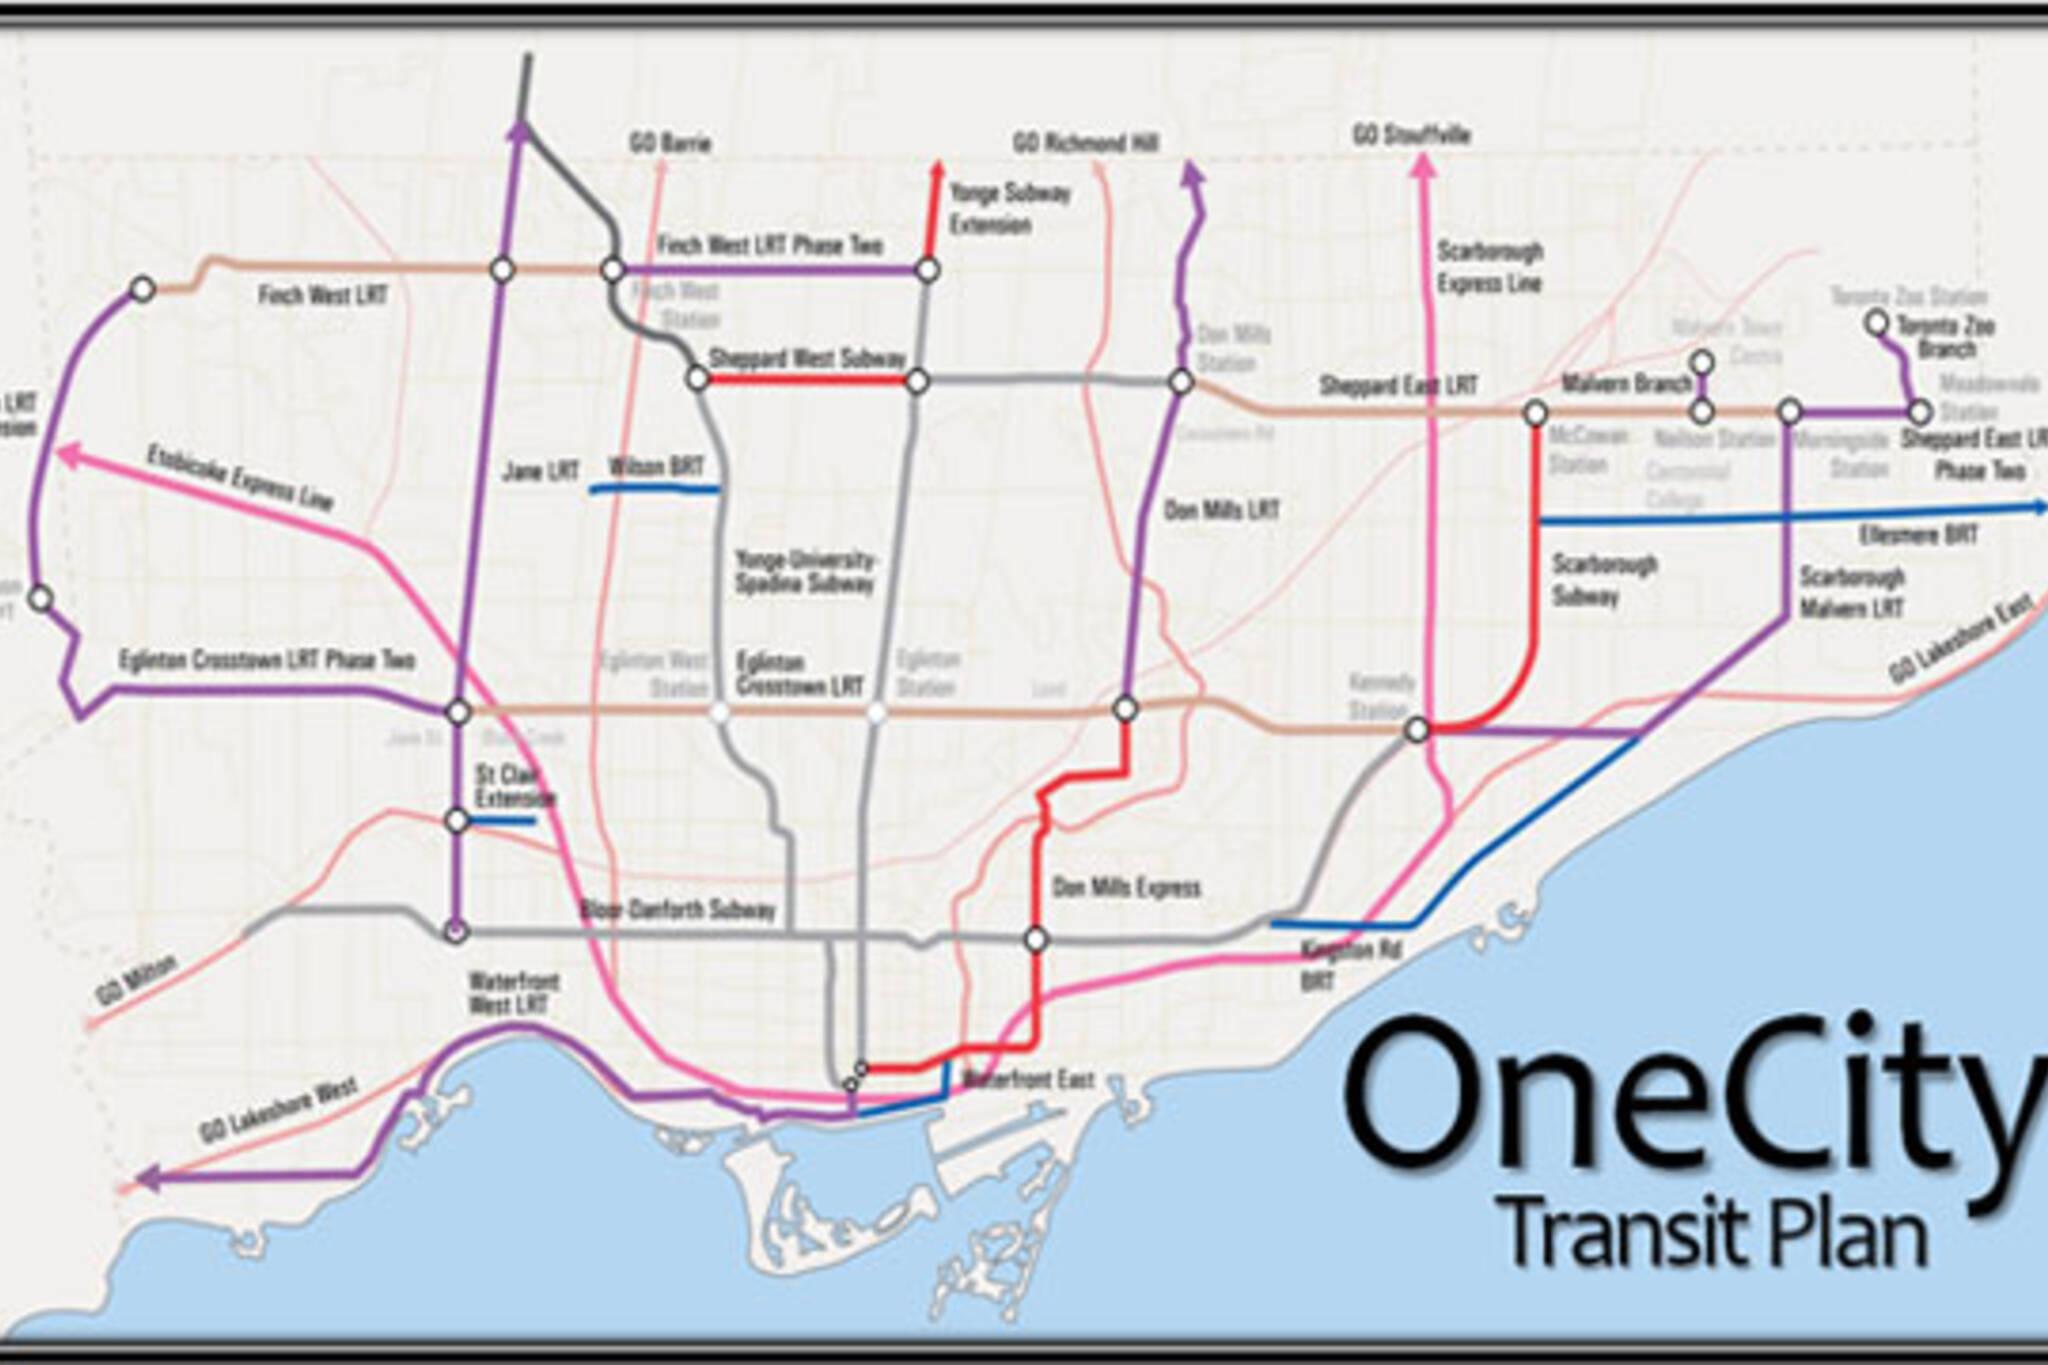 ttc stintz onecity transit map